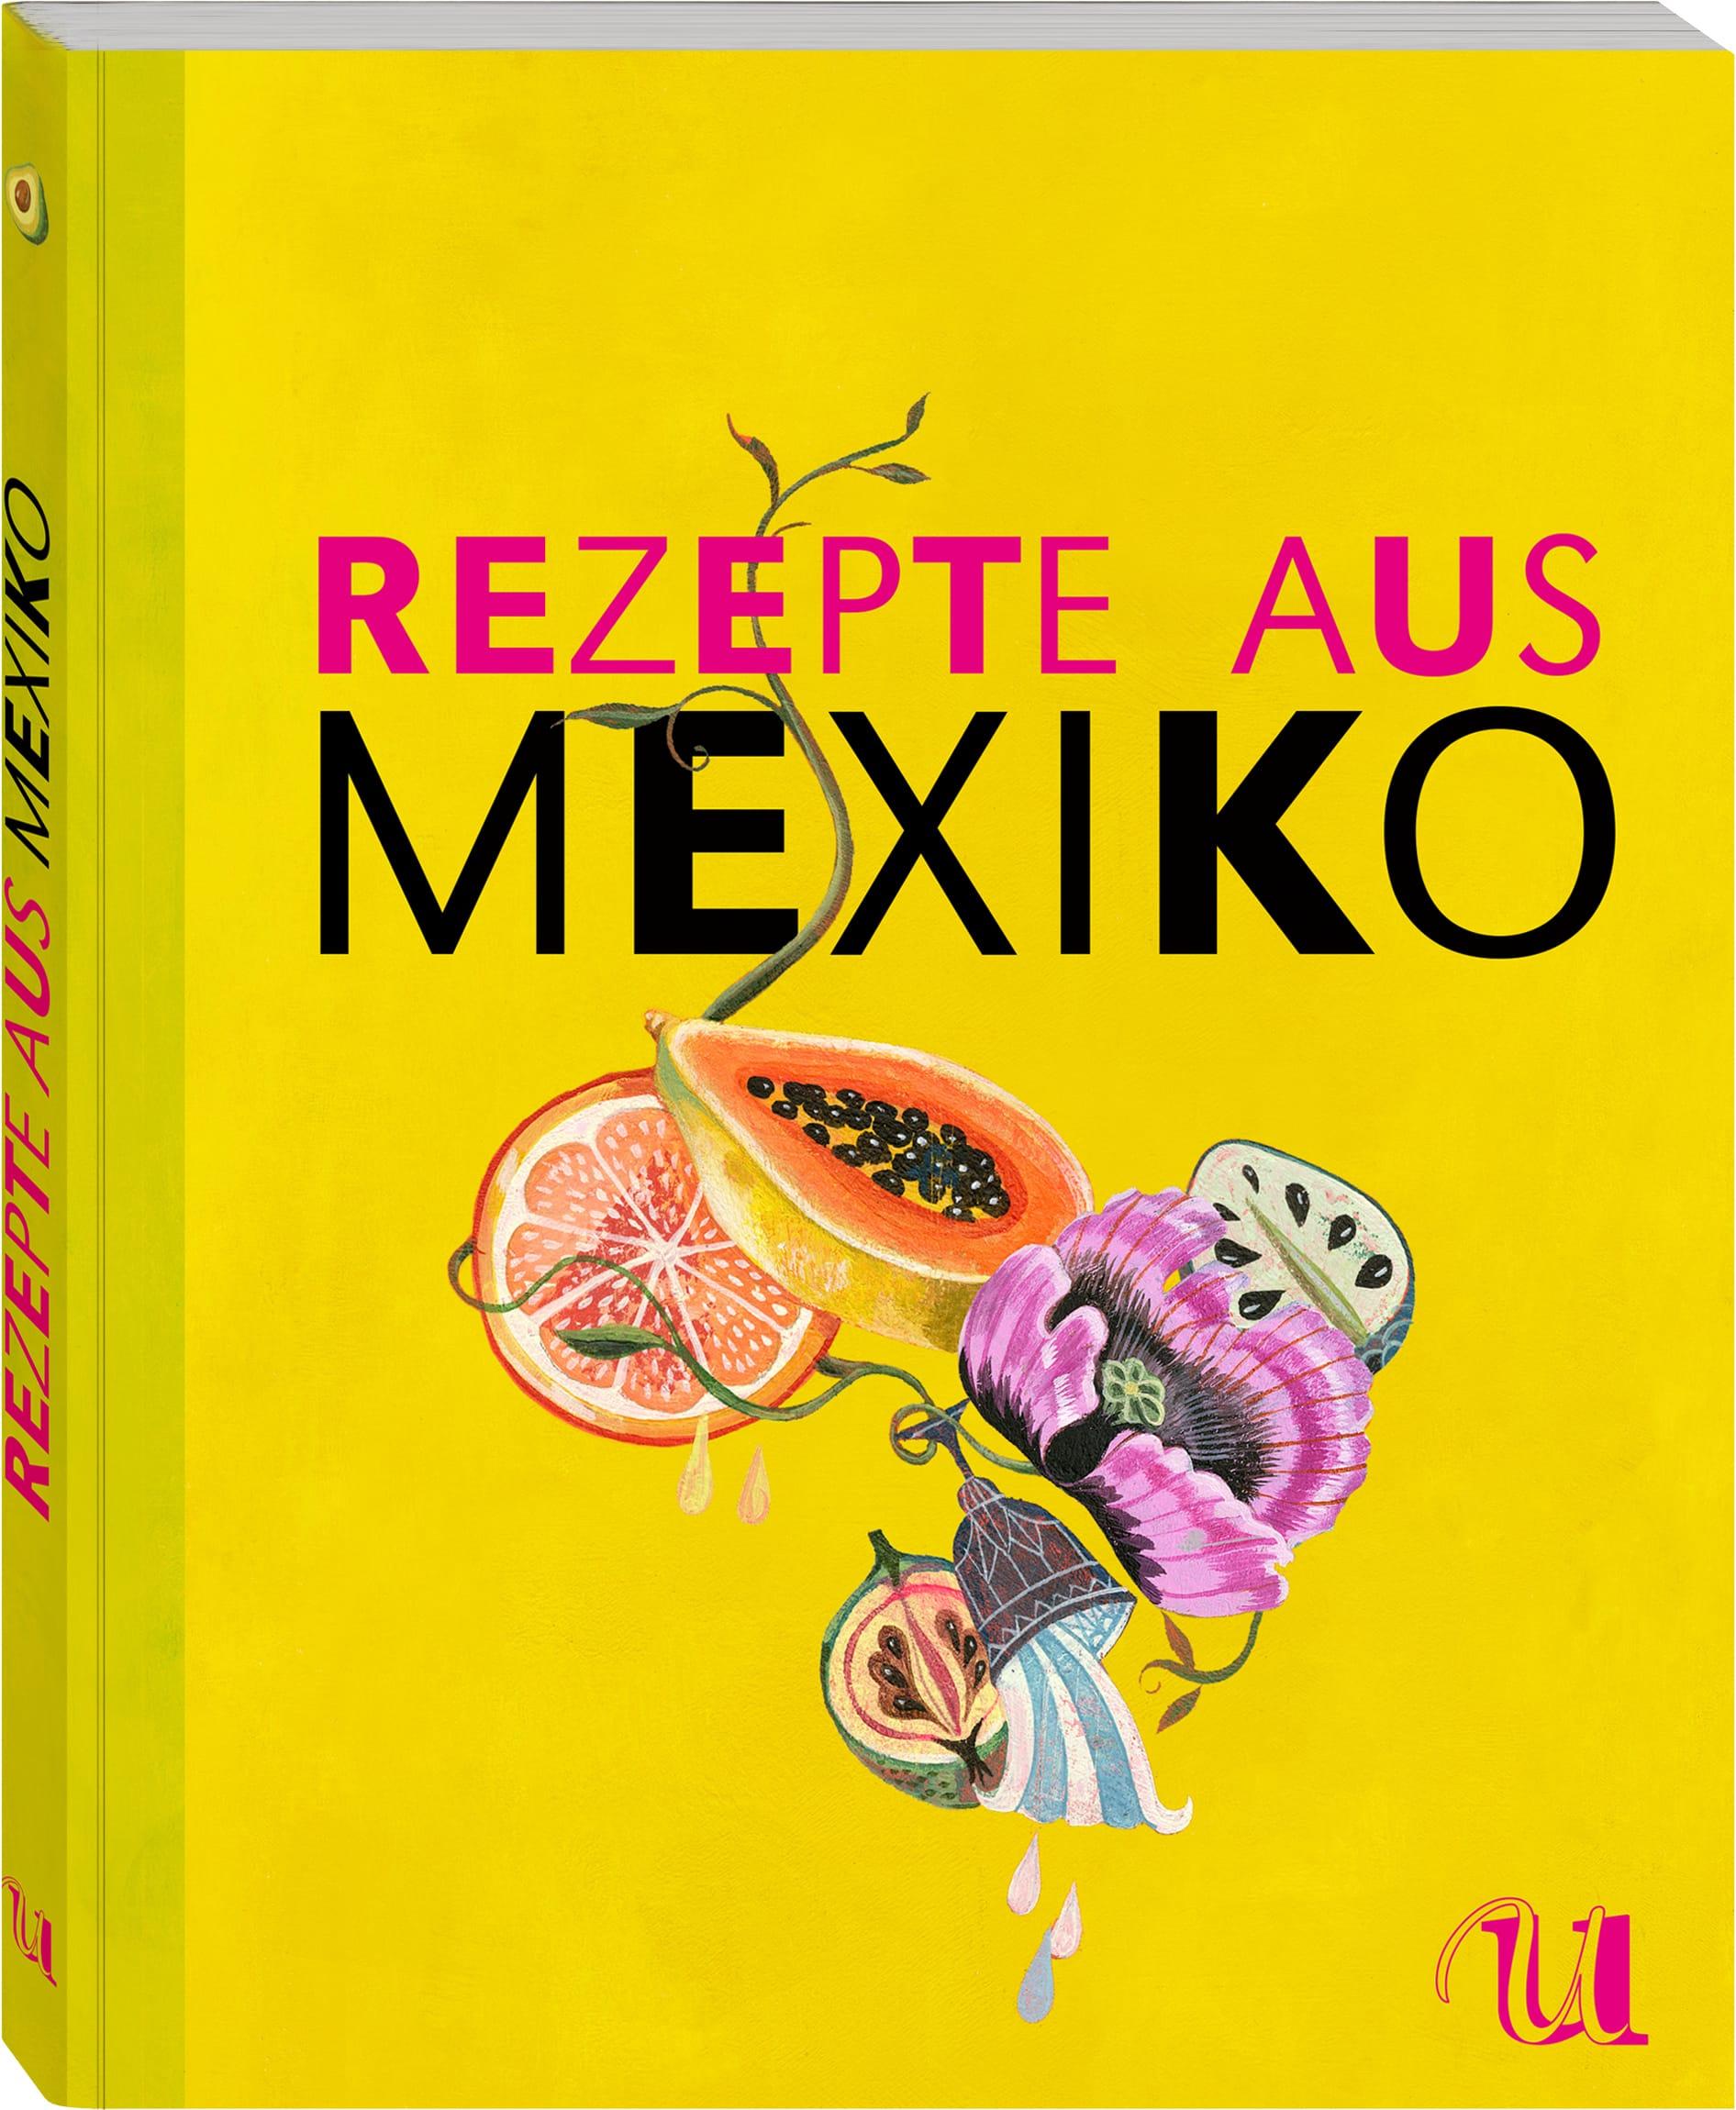 Gelbes Buchcover des Kochbuches rezepte aus Mexiko